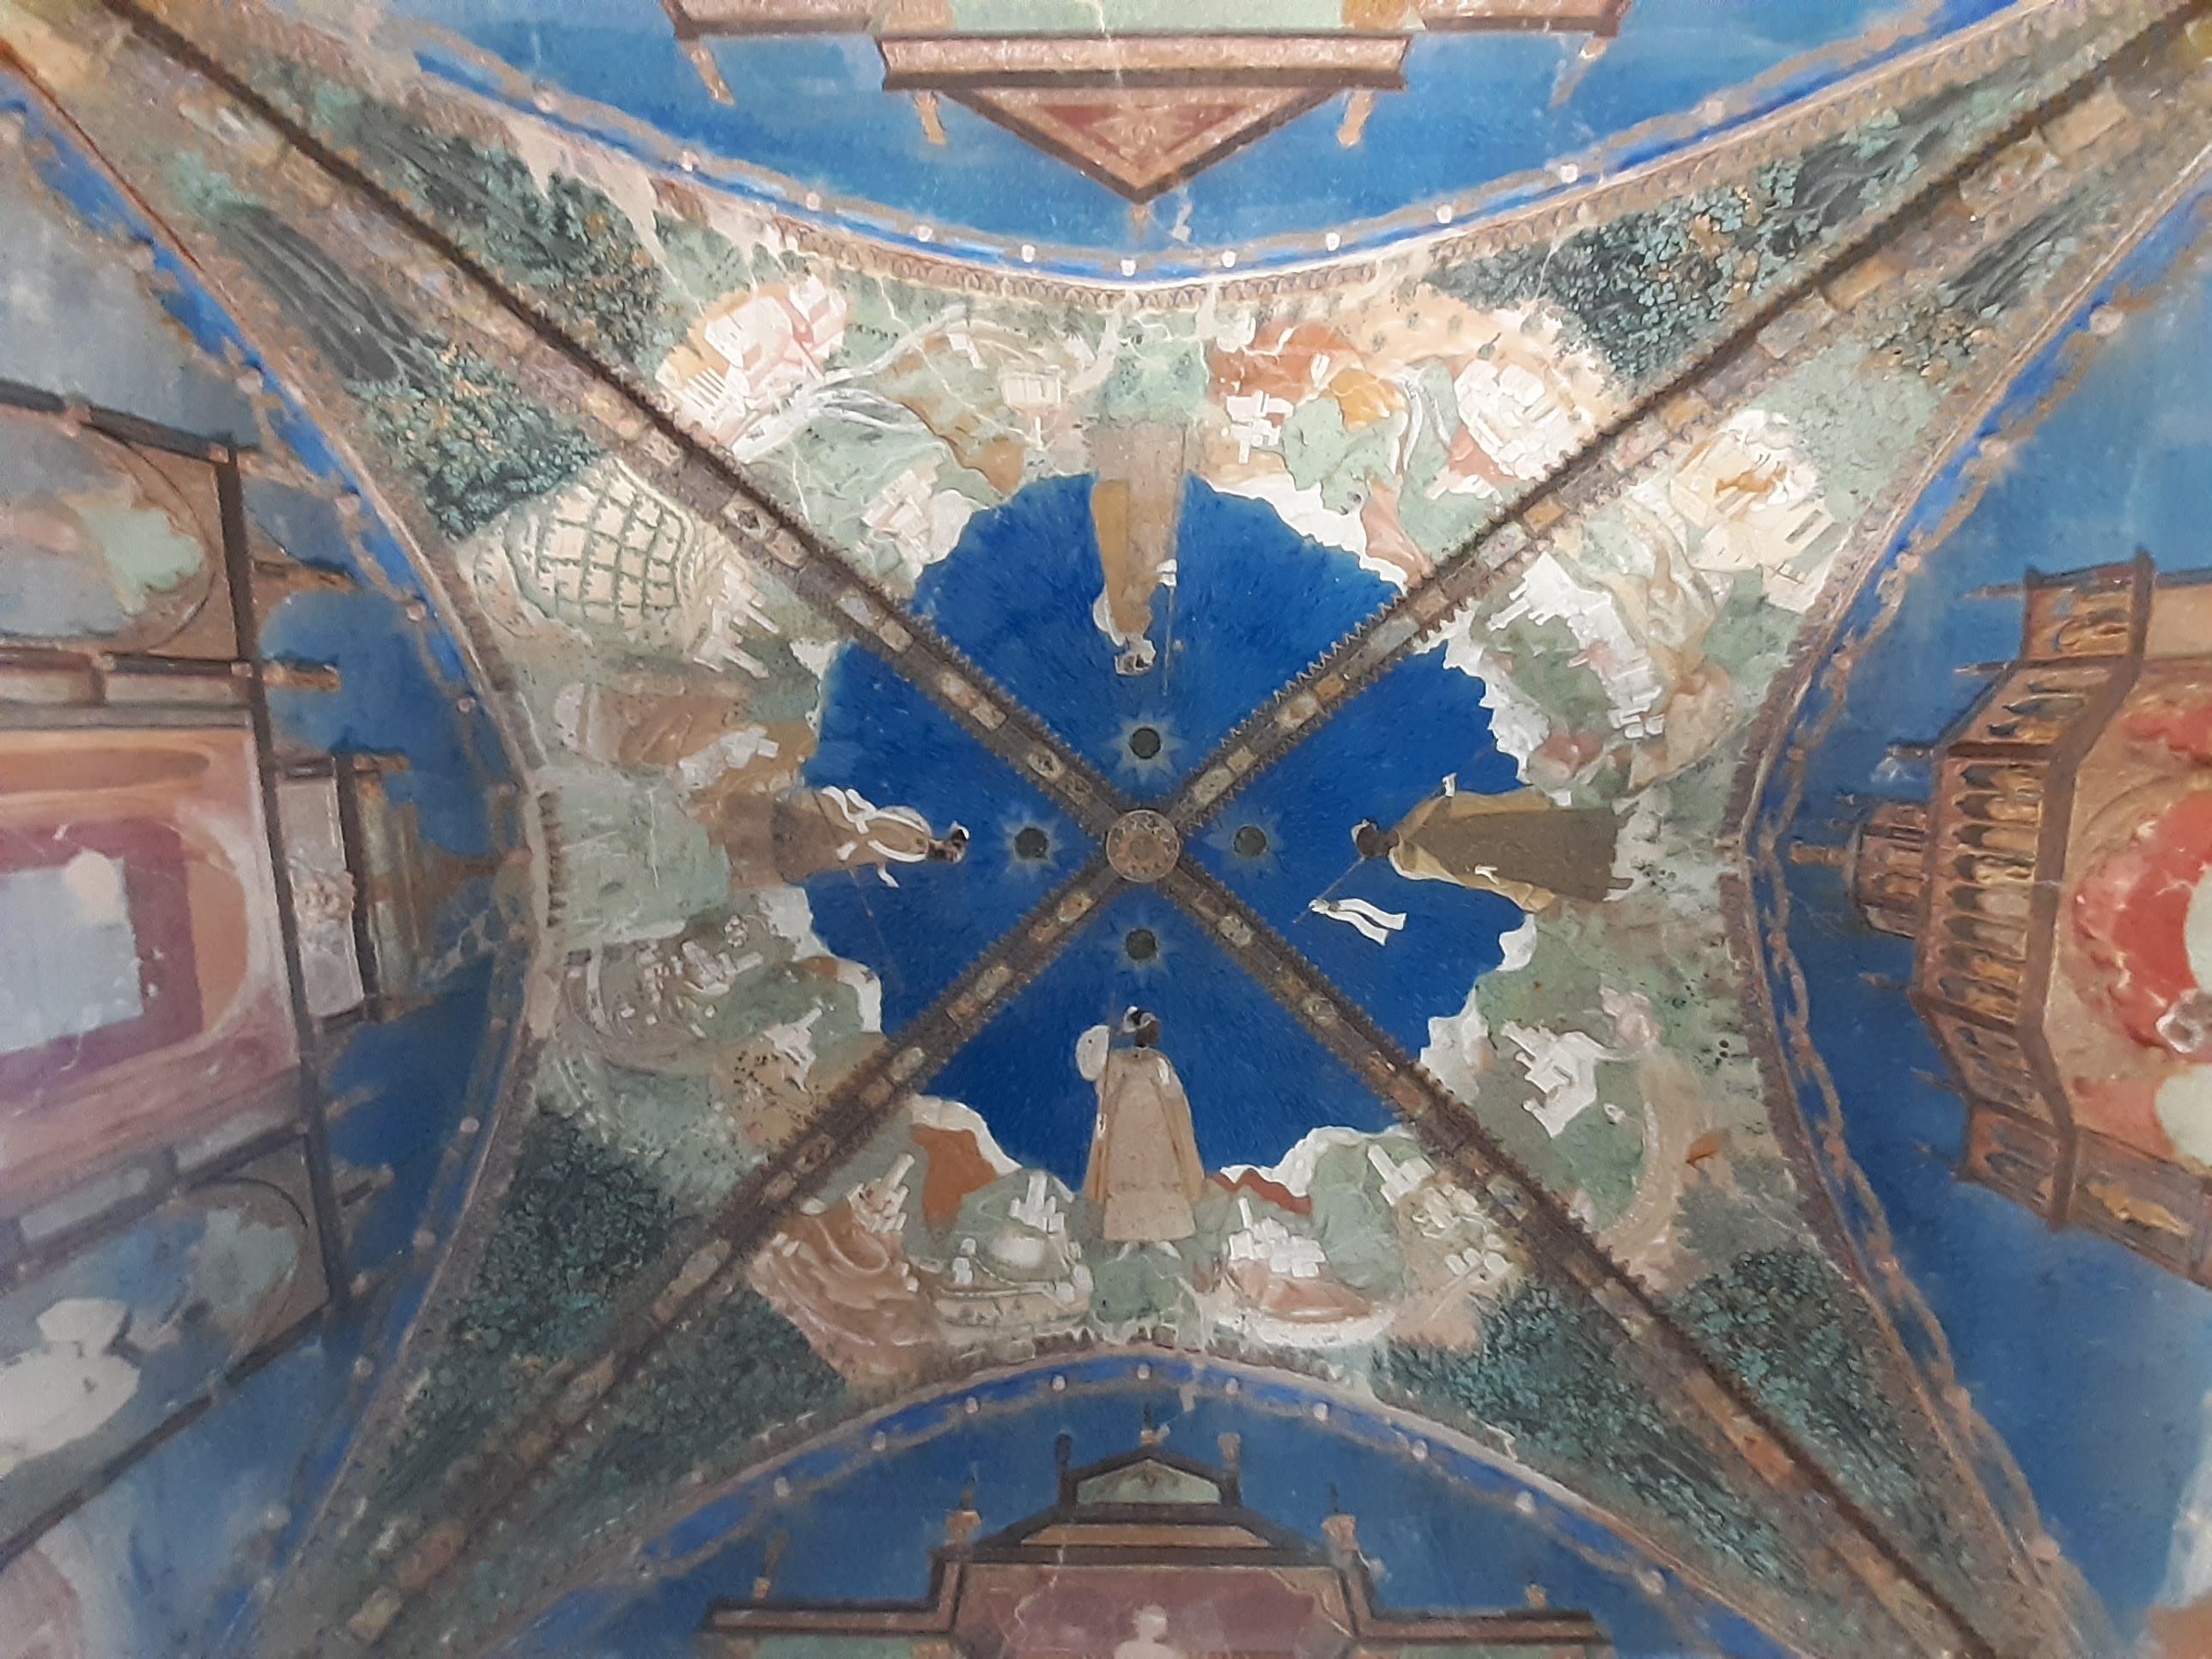 GEP al Castello di Torrechiara